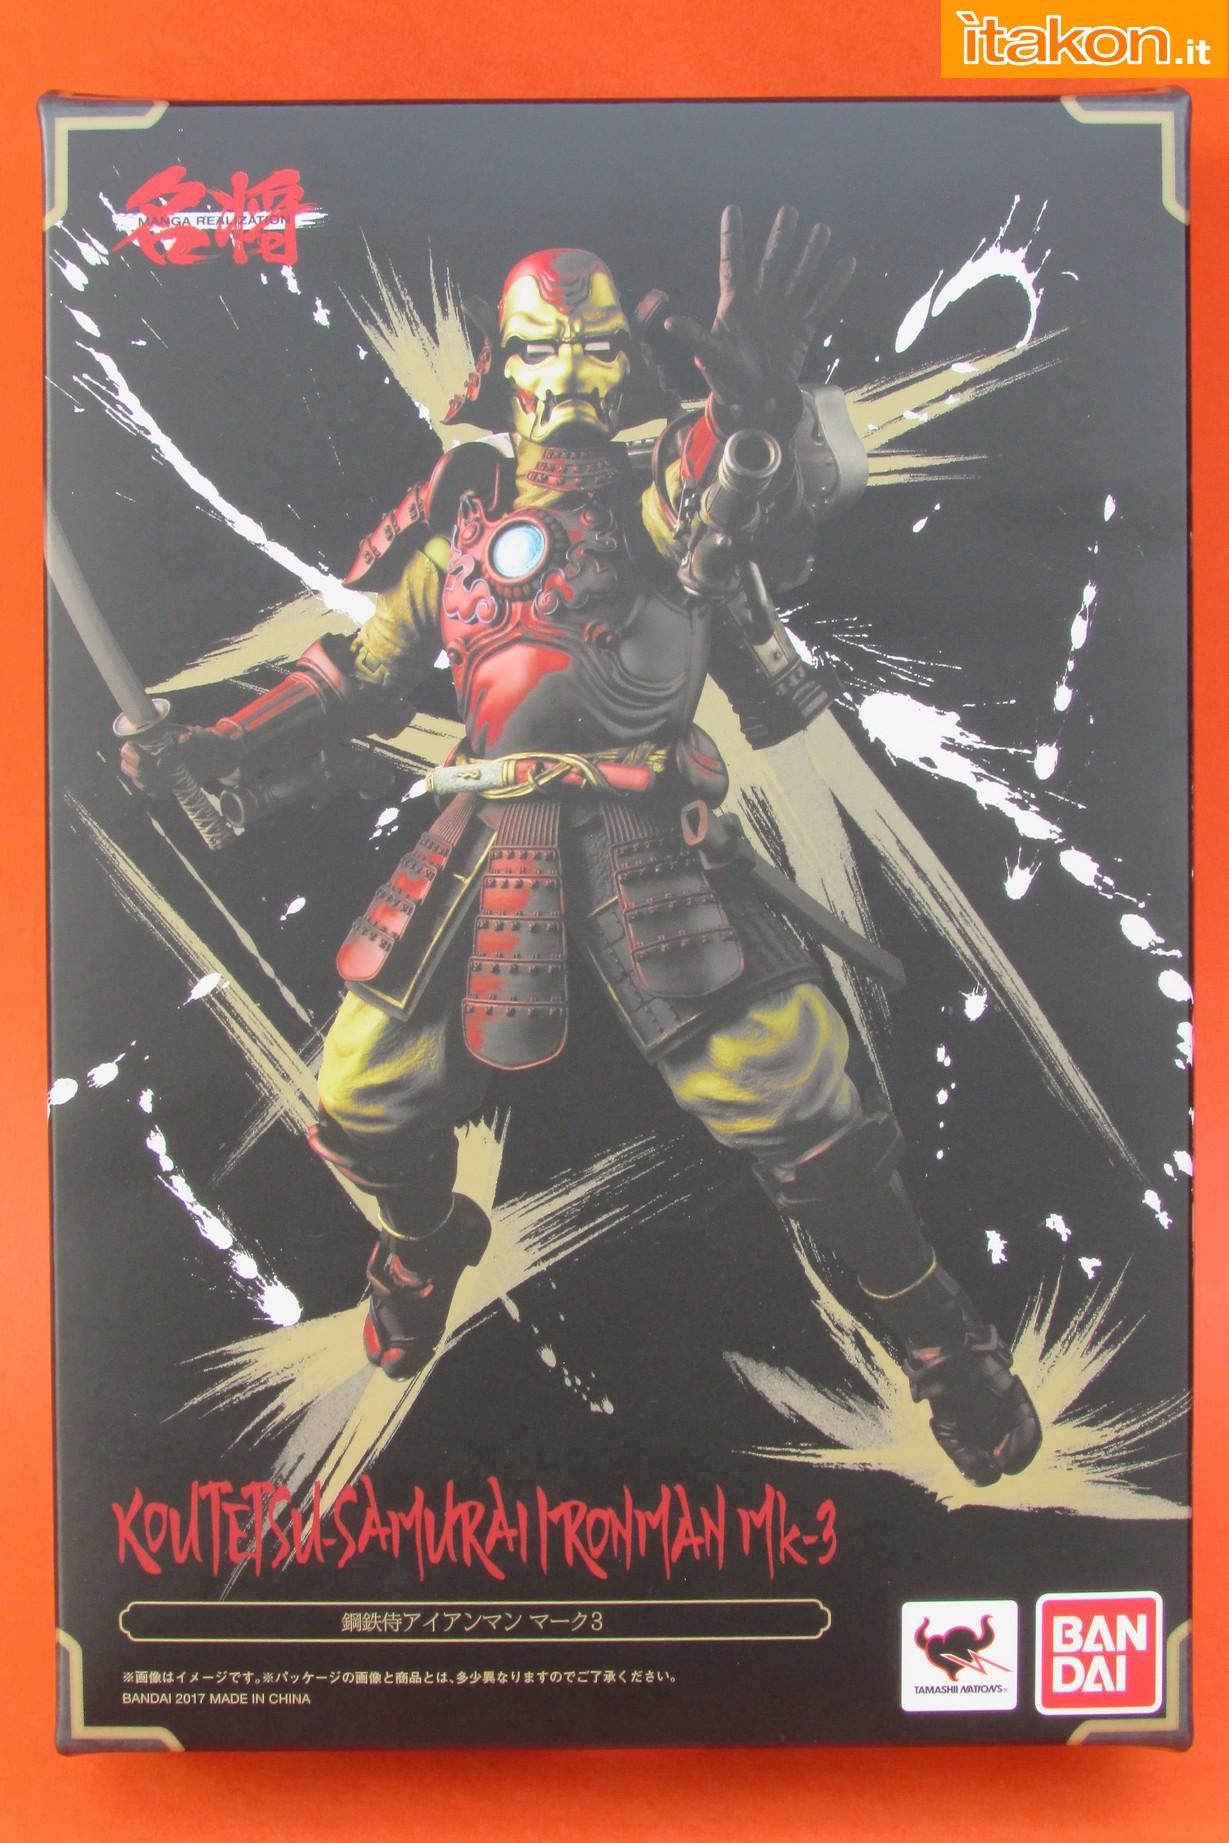 Link a Marvel Comics Koutetsu Samurai Iron Man Mark 3 Meishou MANGA REALIZATION review Bandai Itakon.it01